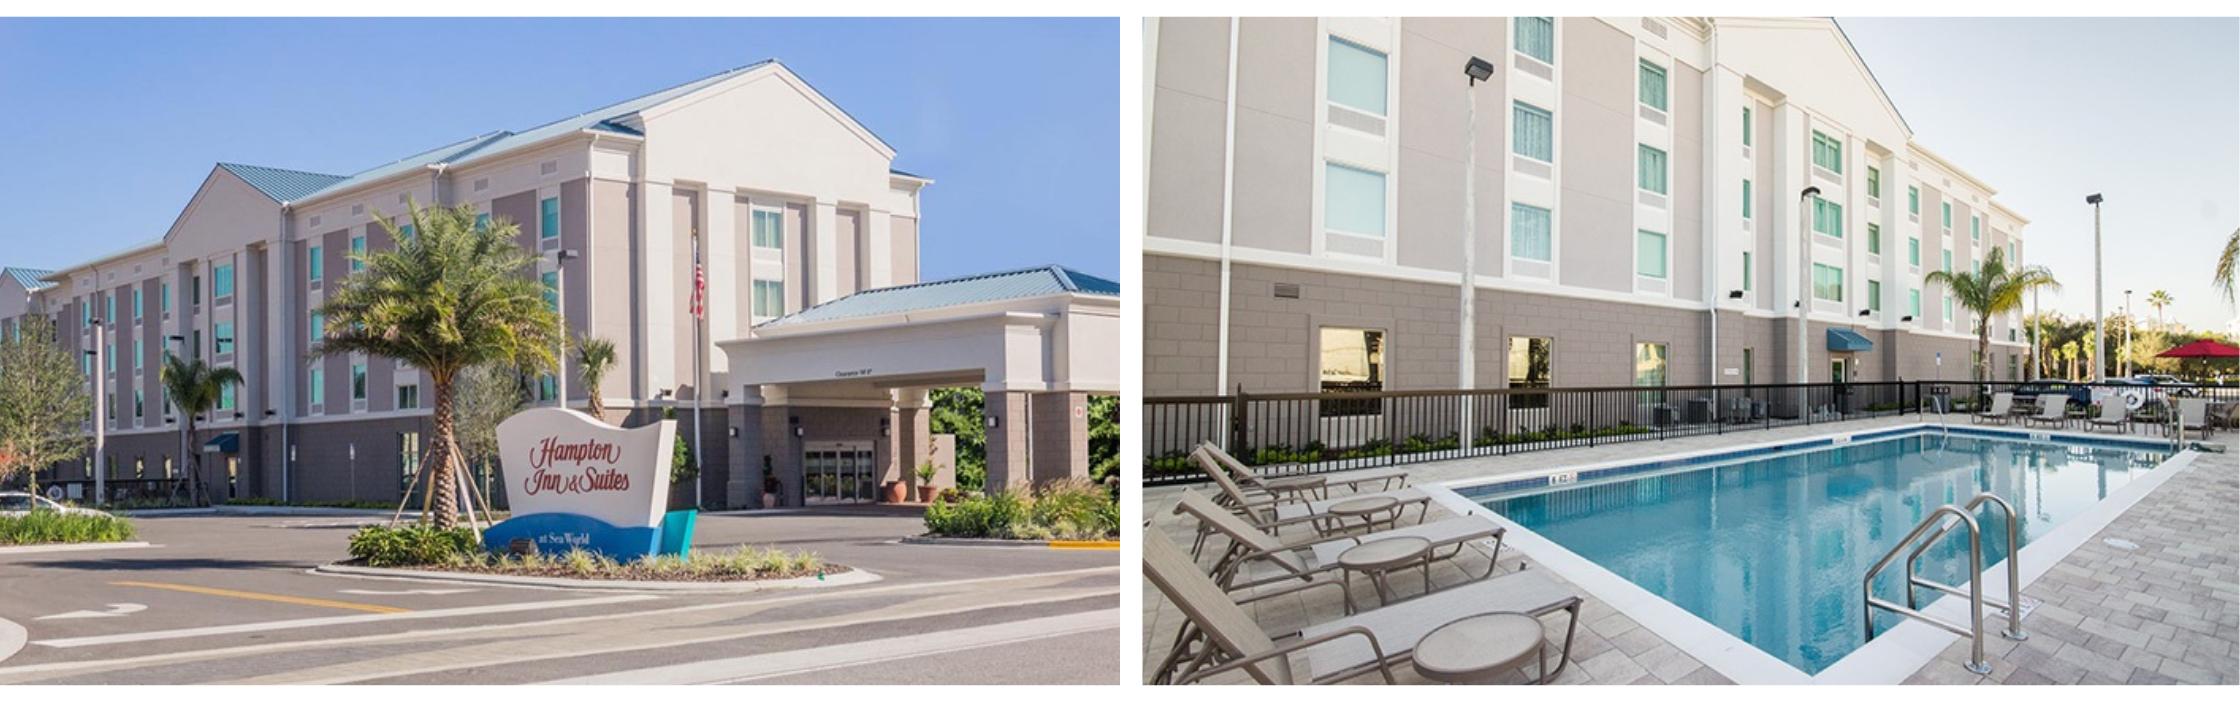 hampton inn and suites orlando